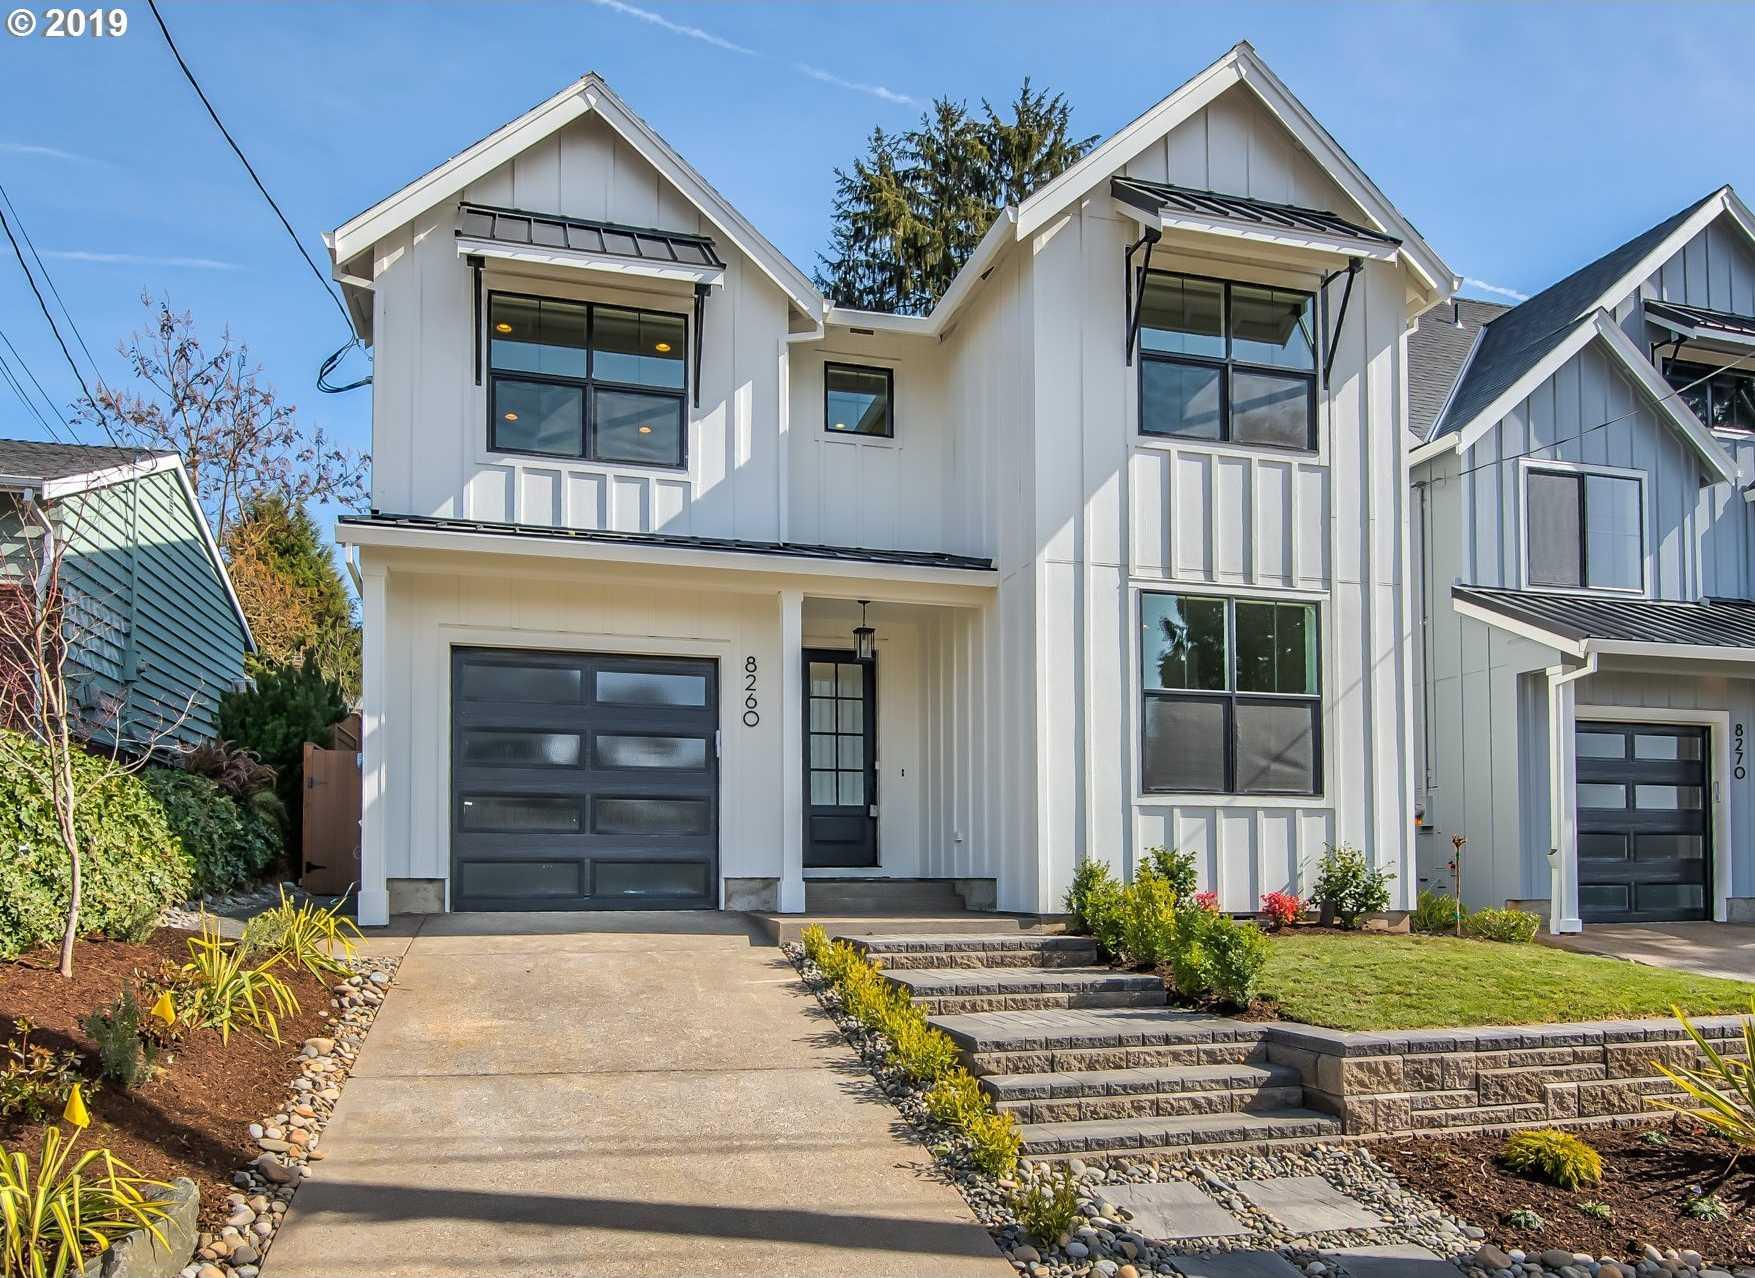 $799,900 - 4Br/3Ba -  for Sale in South Burlingame, Portland